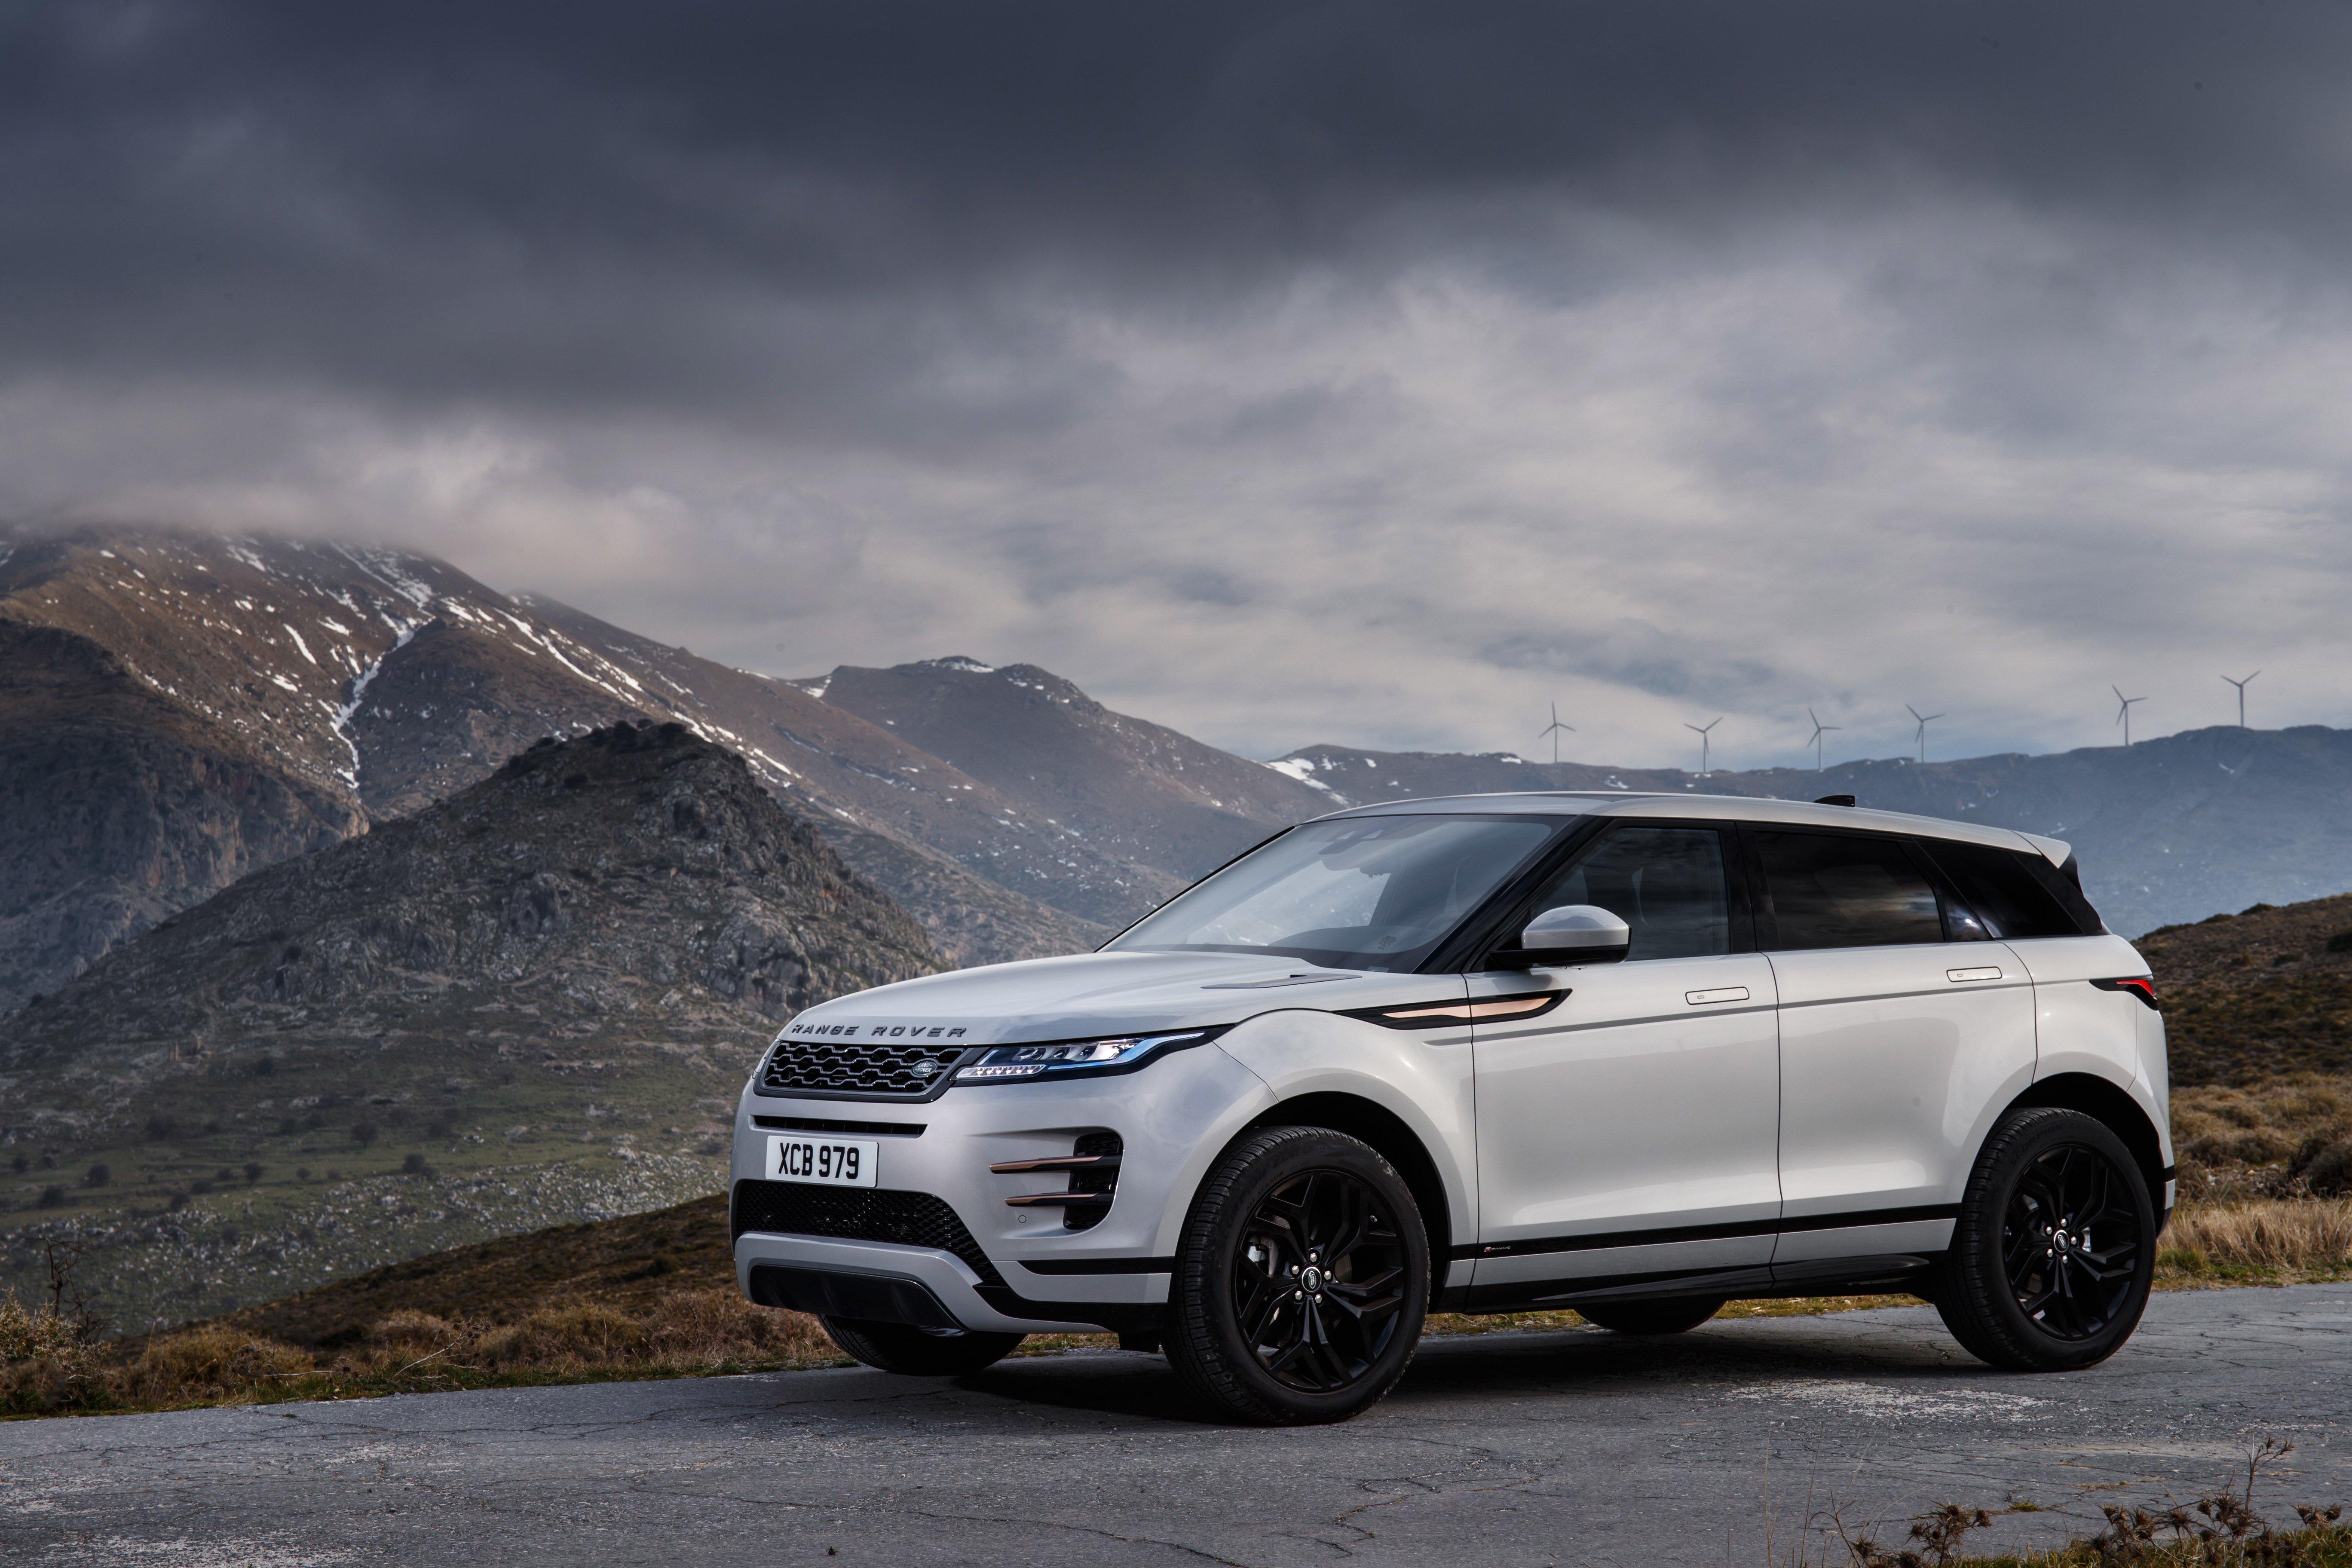 Range Rover Evoque >> MEGA GALLERY: 2019 Range Rover Evoque in Greece Paul Tan - Image 951843